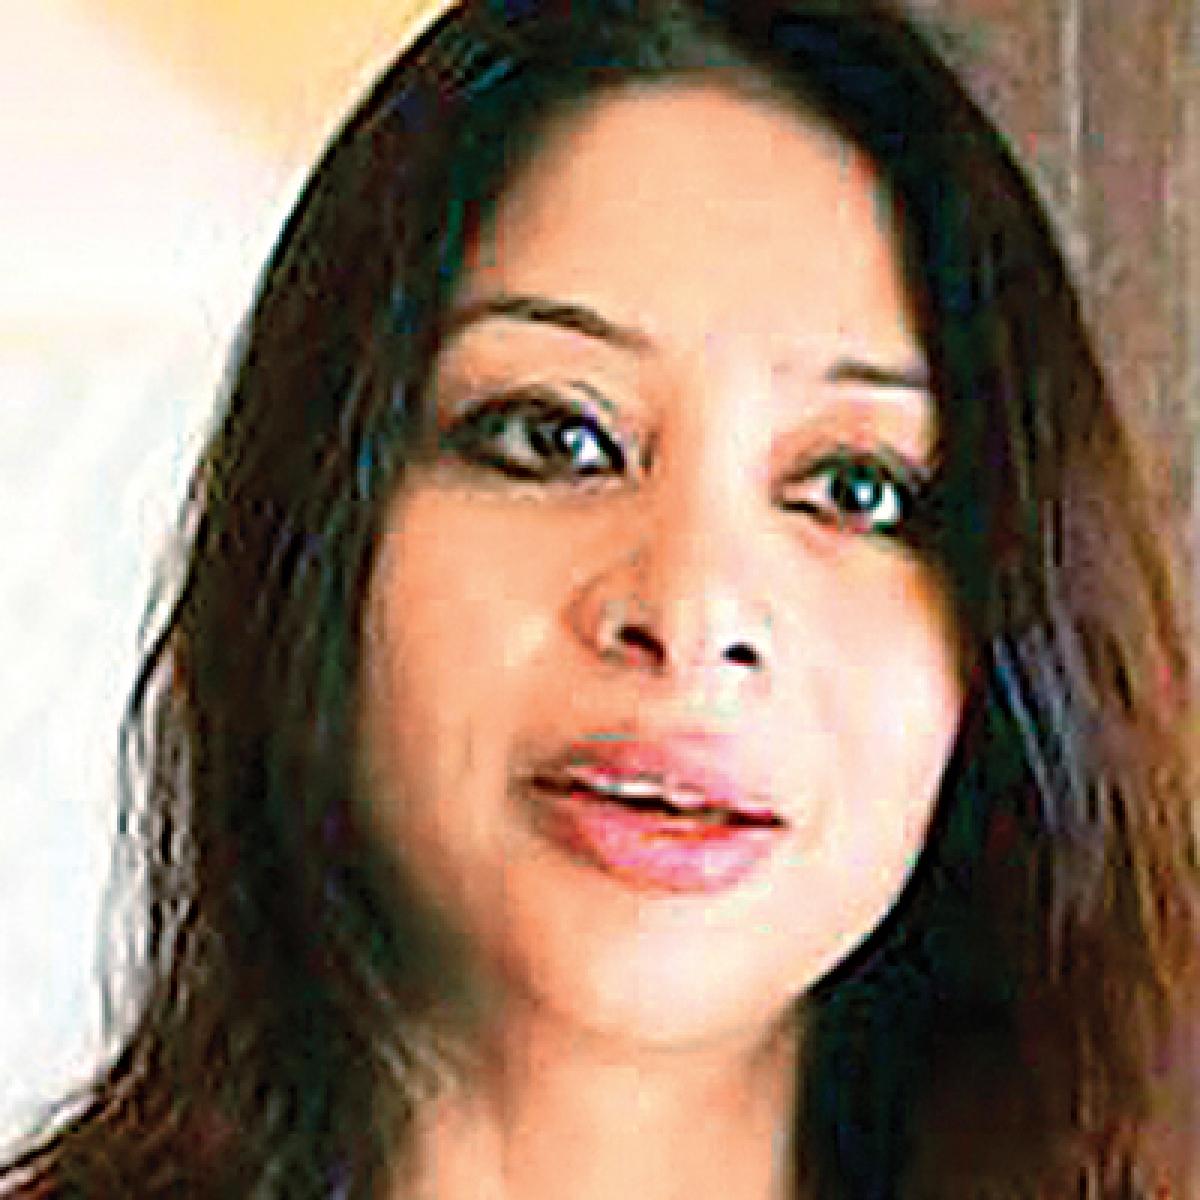 Indrani, Peter upset about Sheena-Rahul relationship